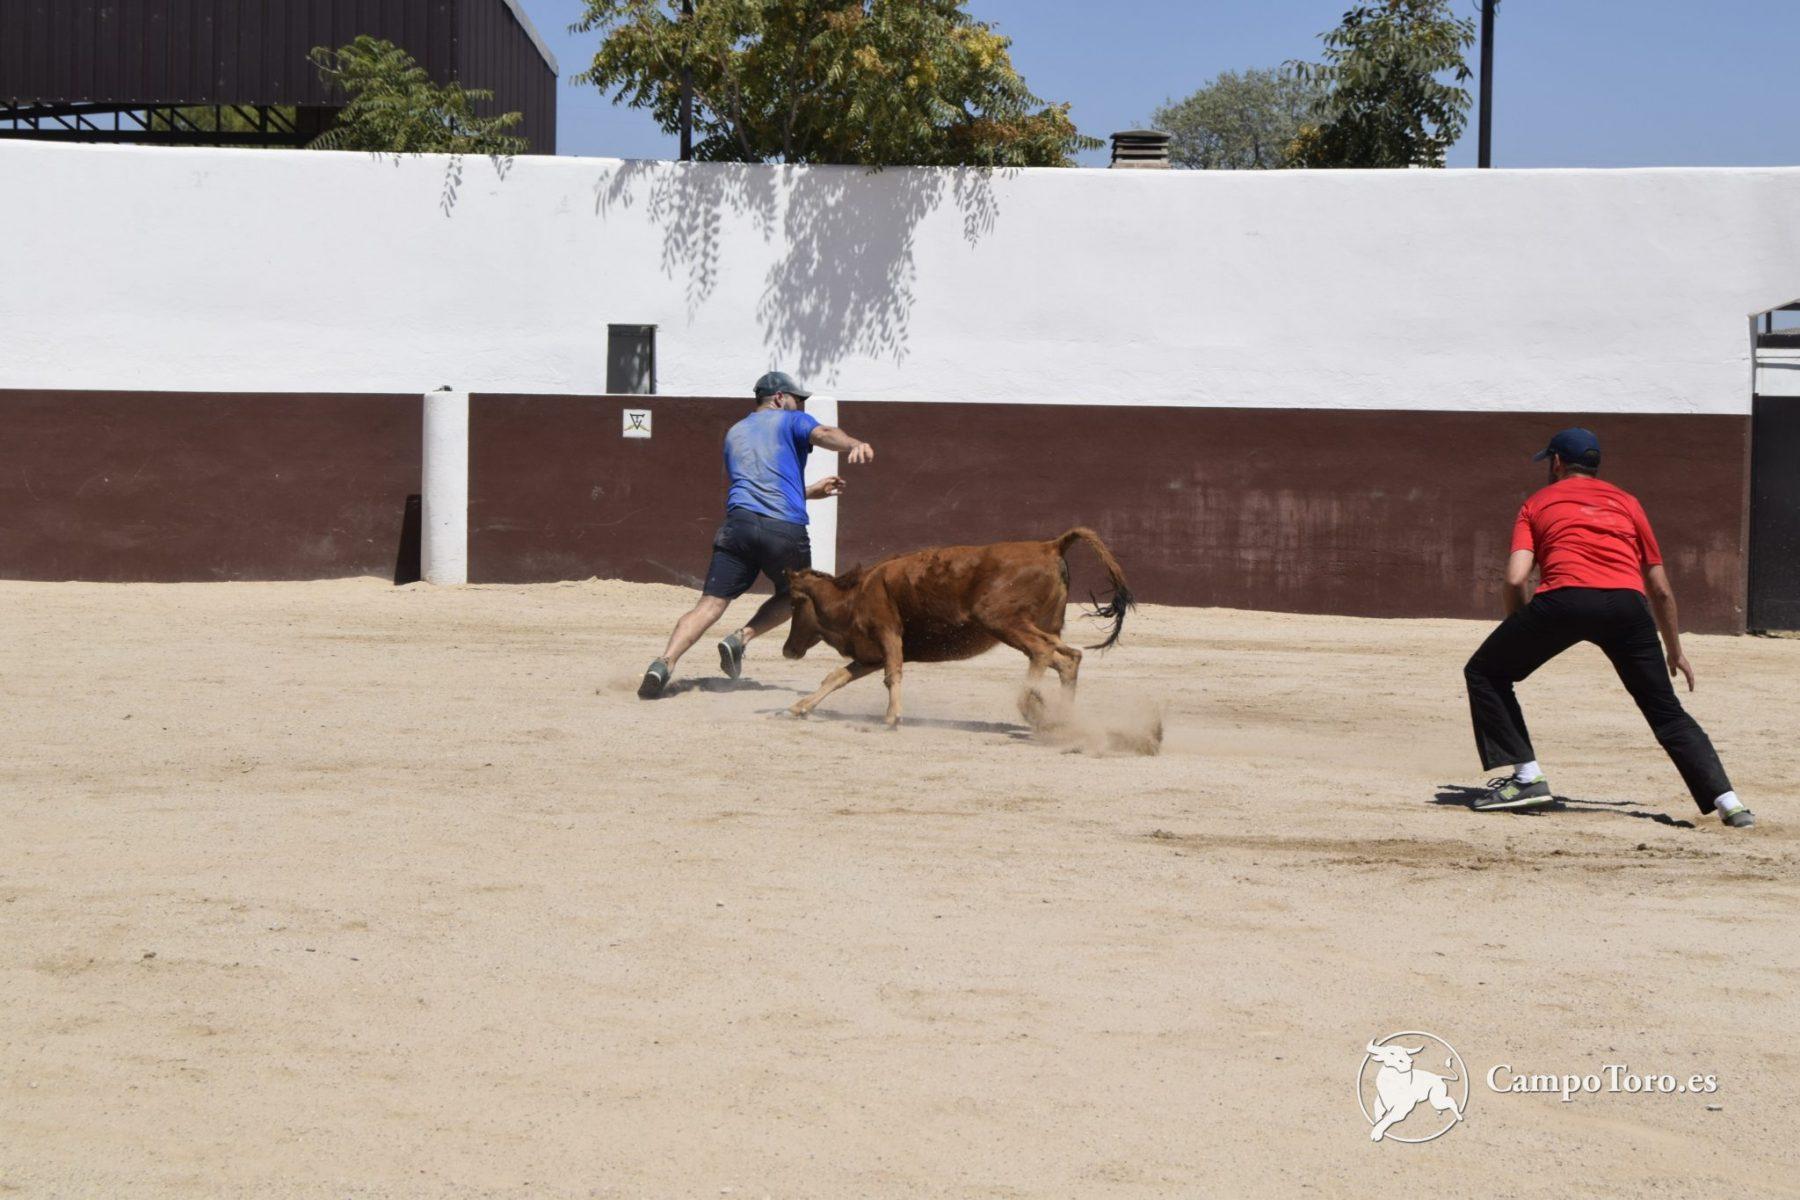 Like a bullfighter